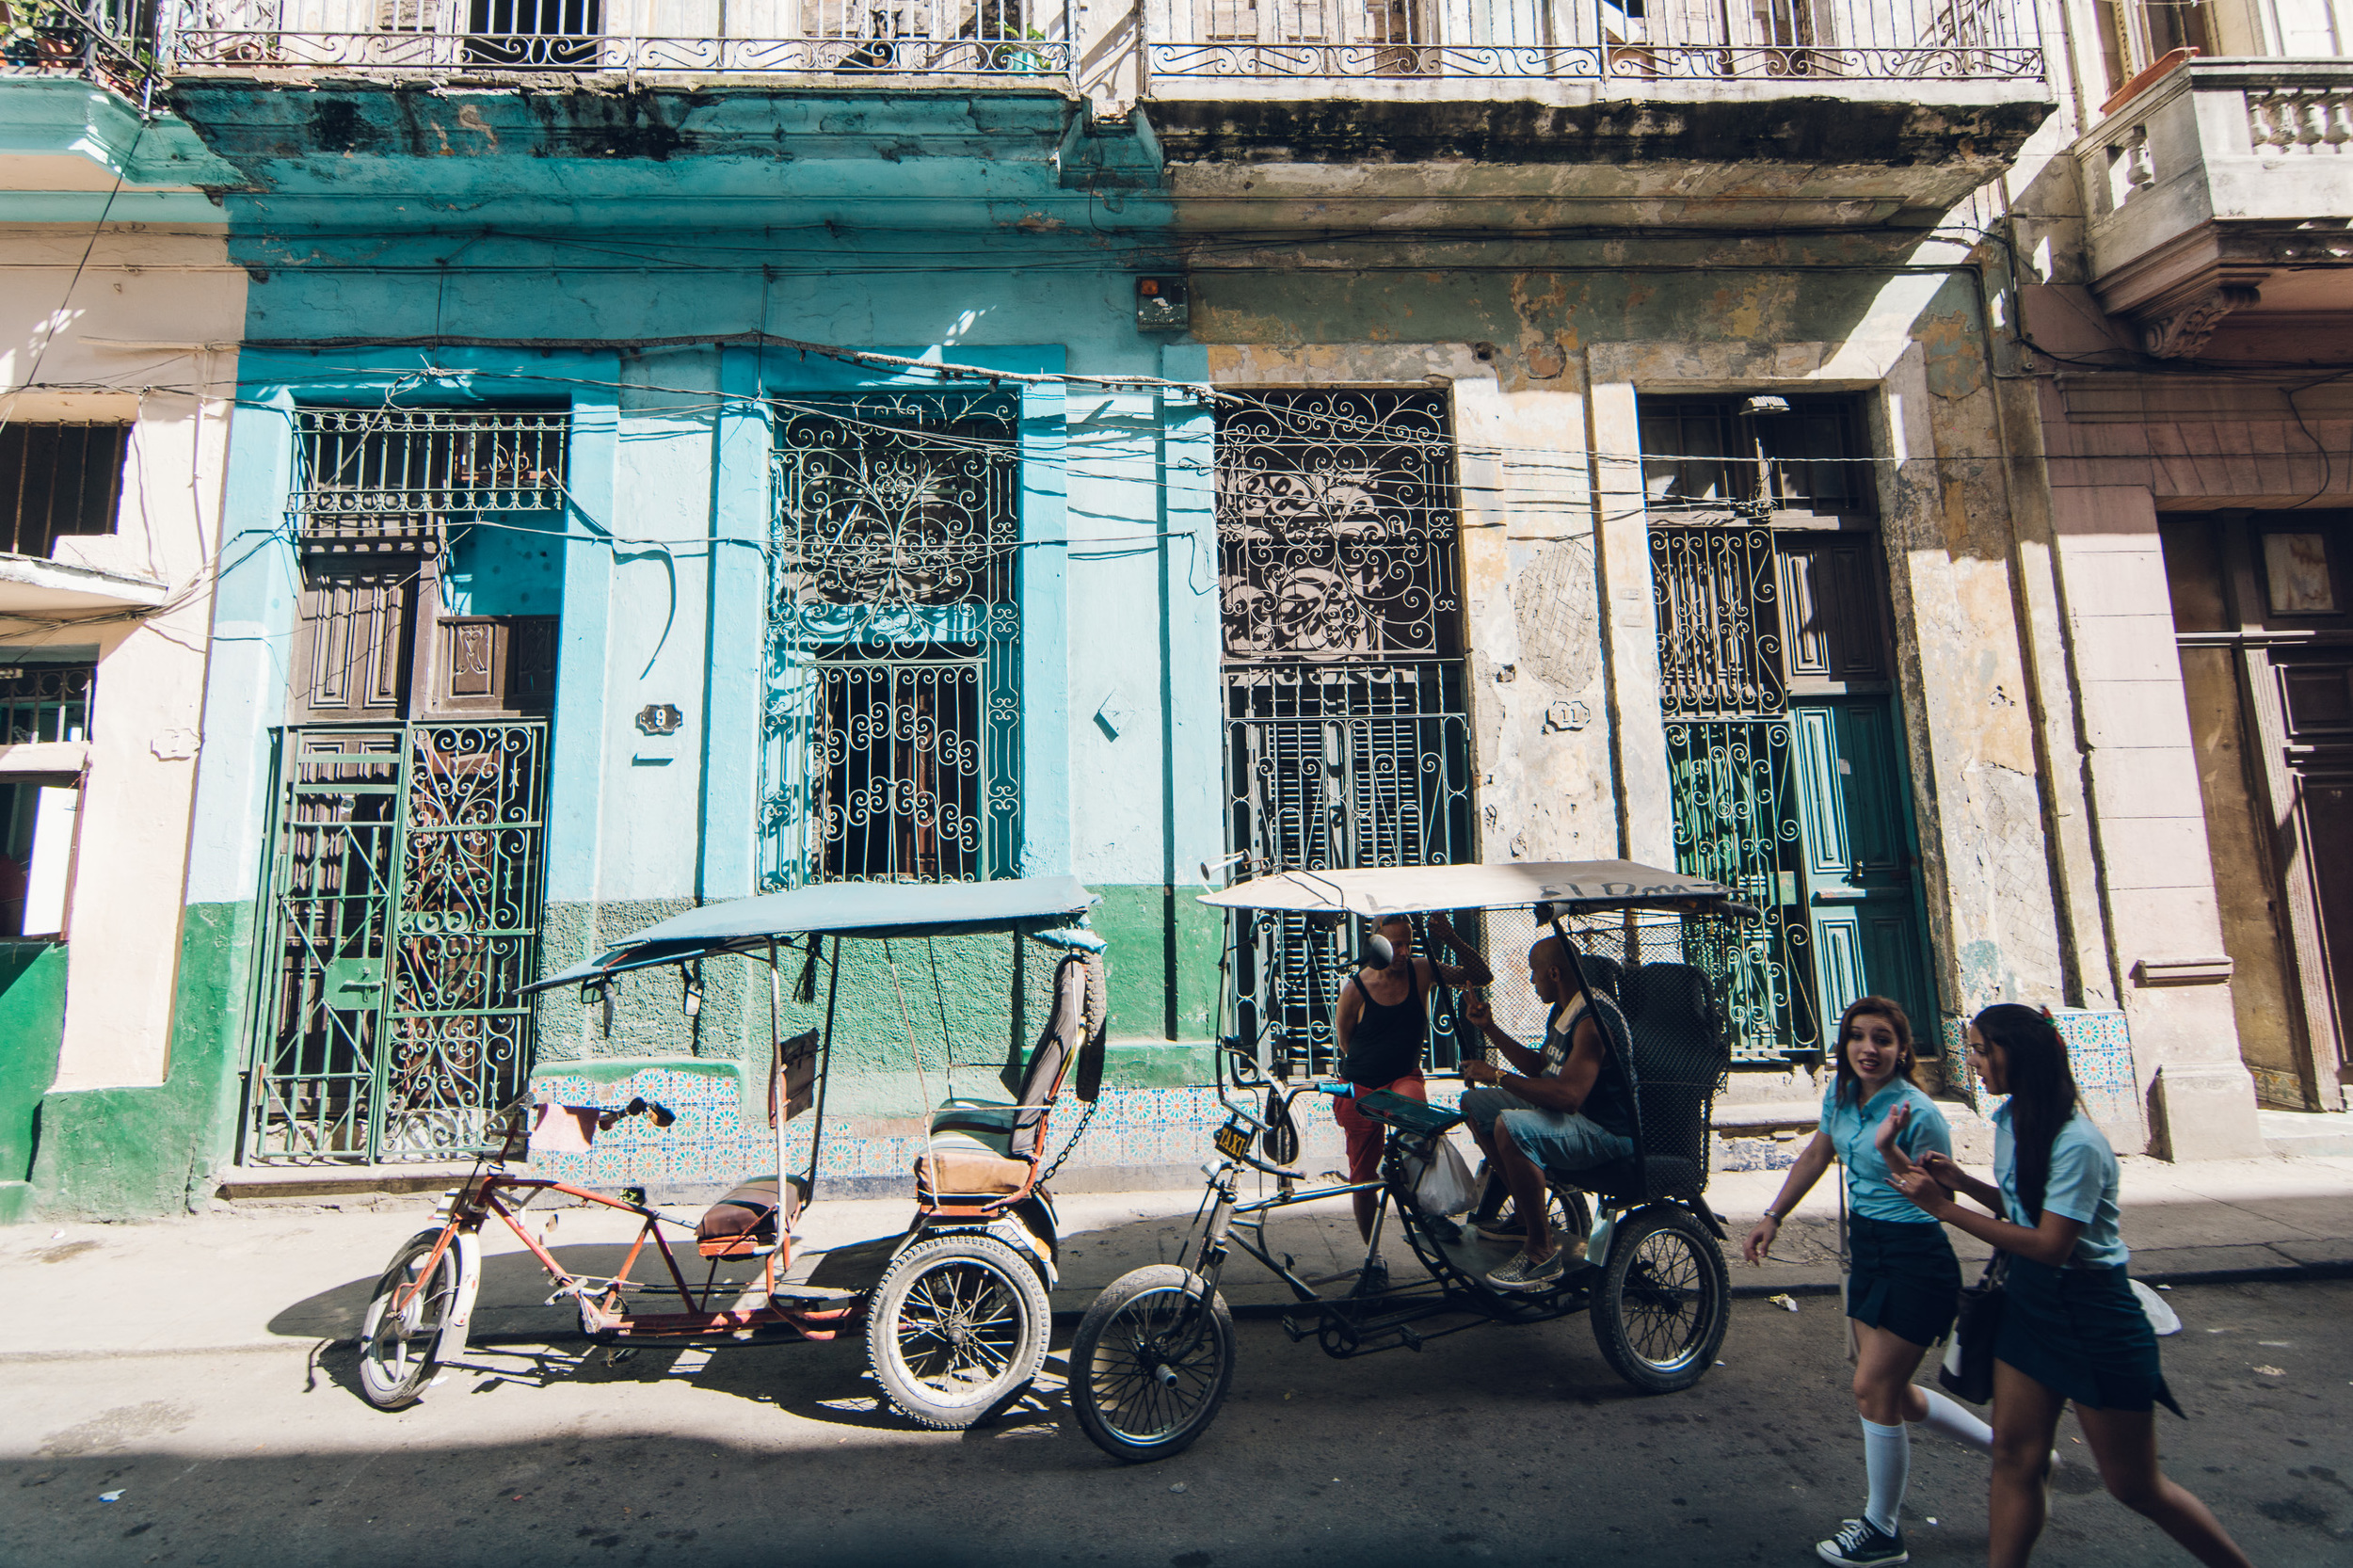 DeClaro-Photography-Cuba-02428.jpg